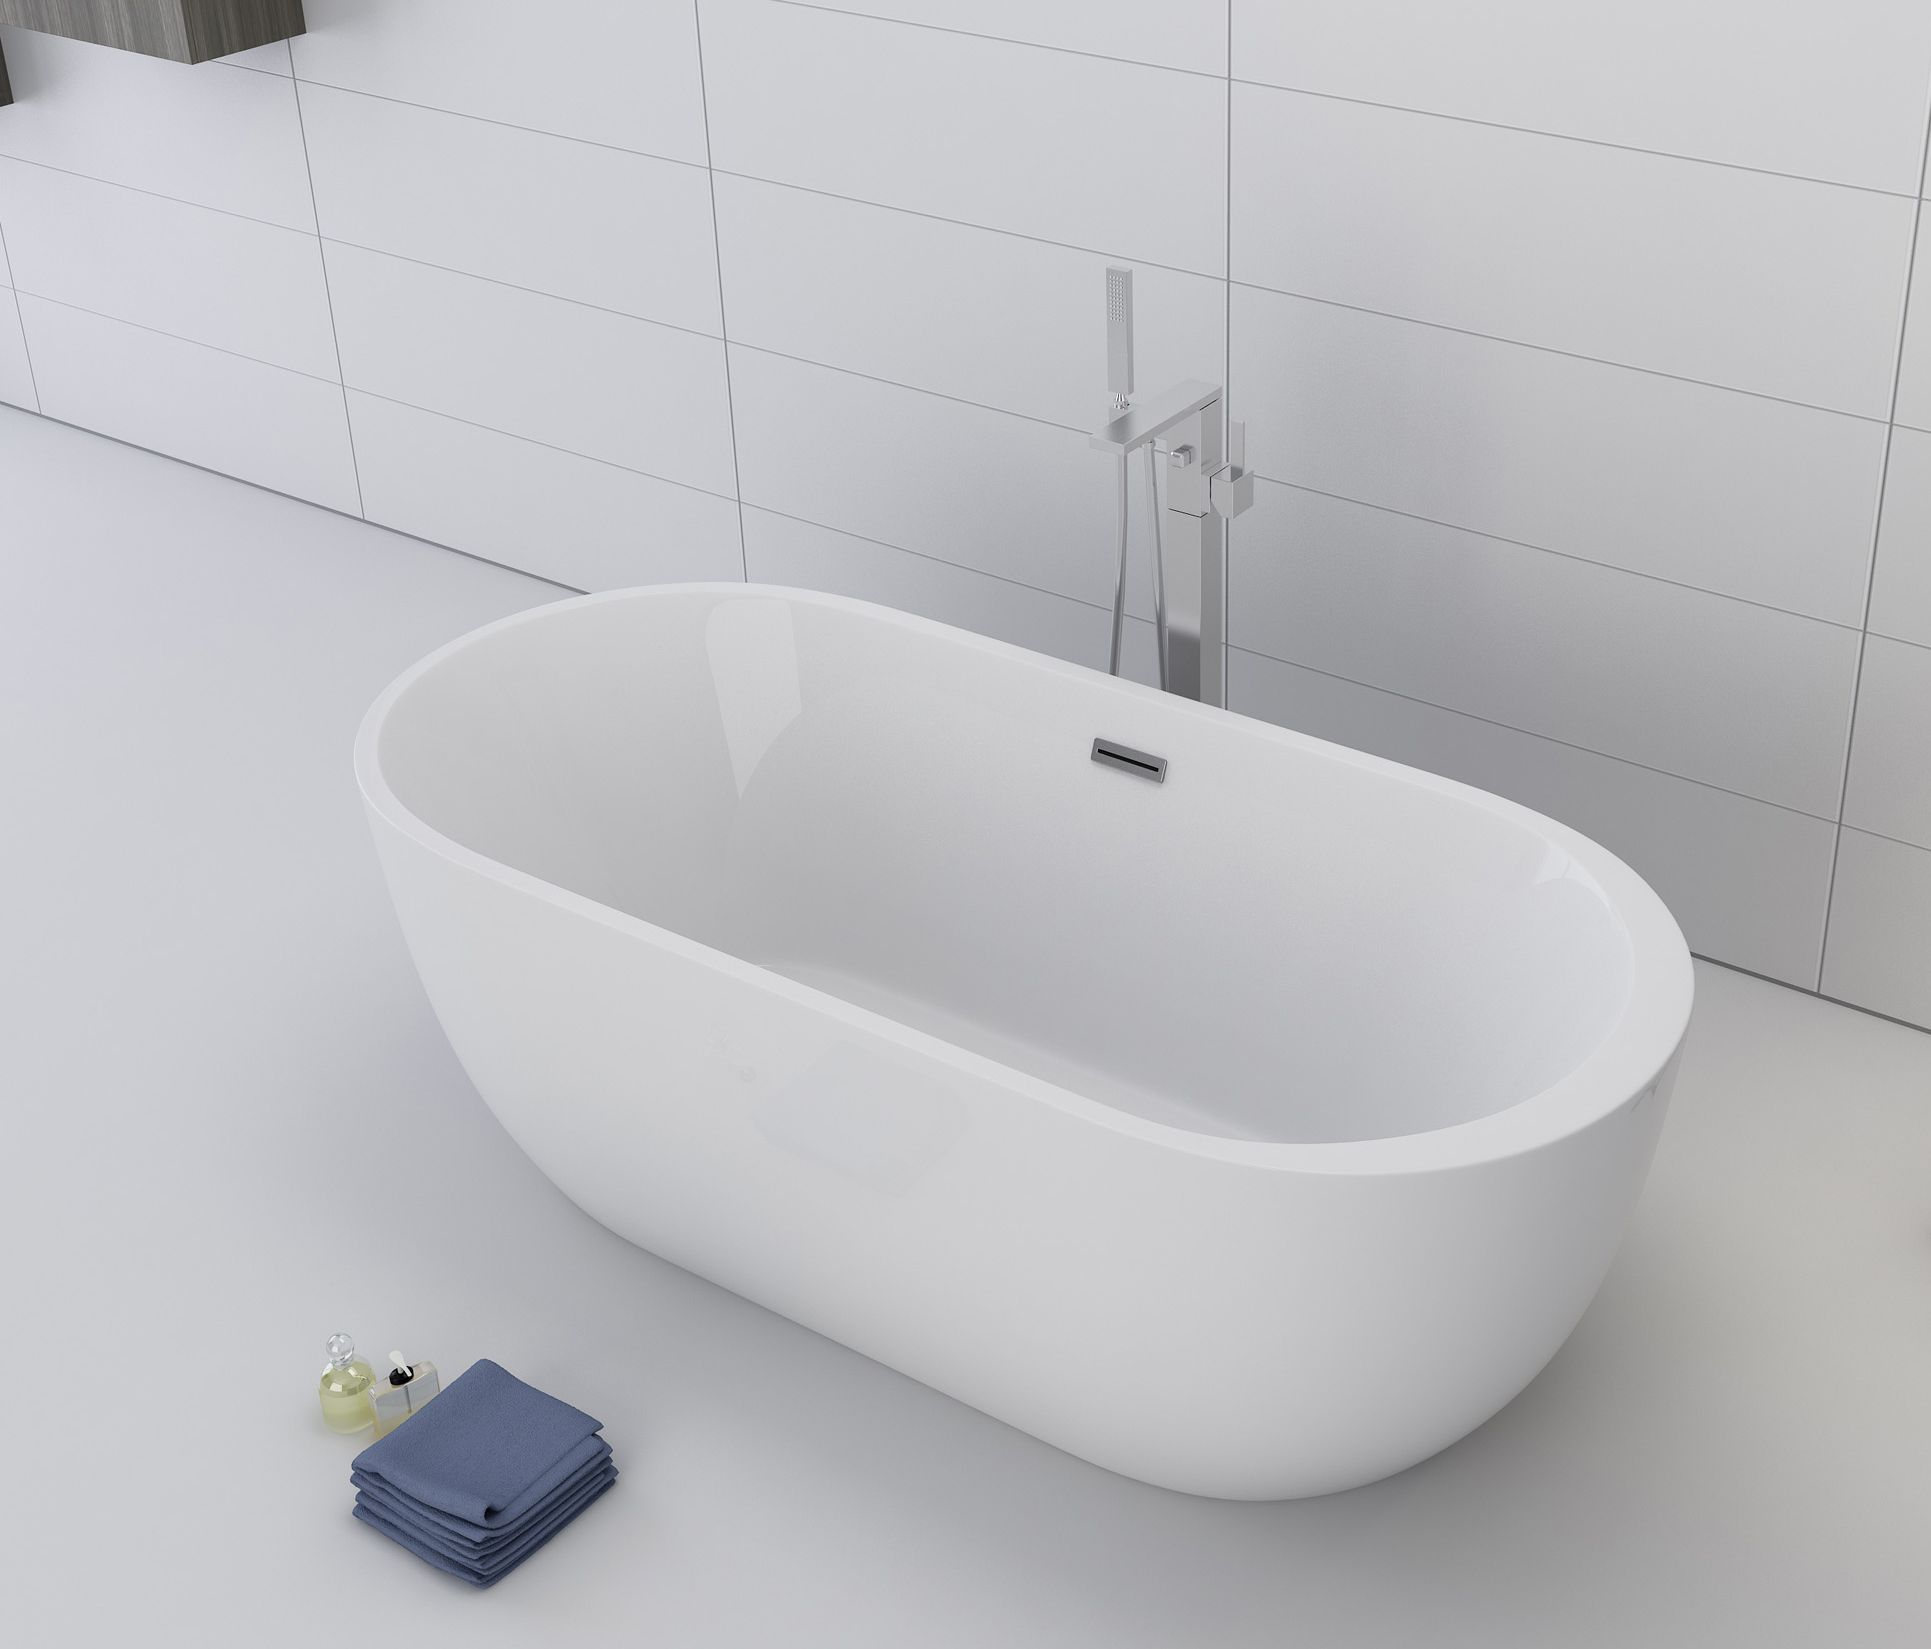 freistehende Badewanne BW-IX036